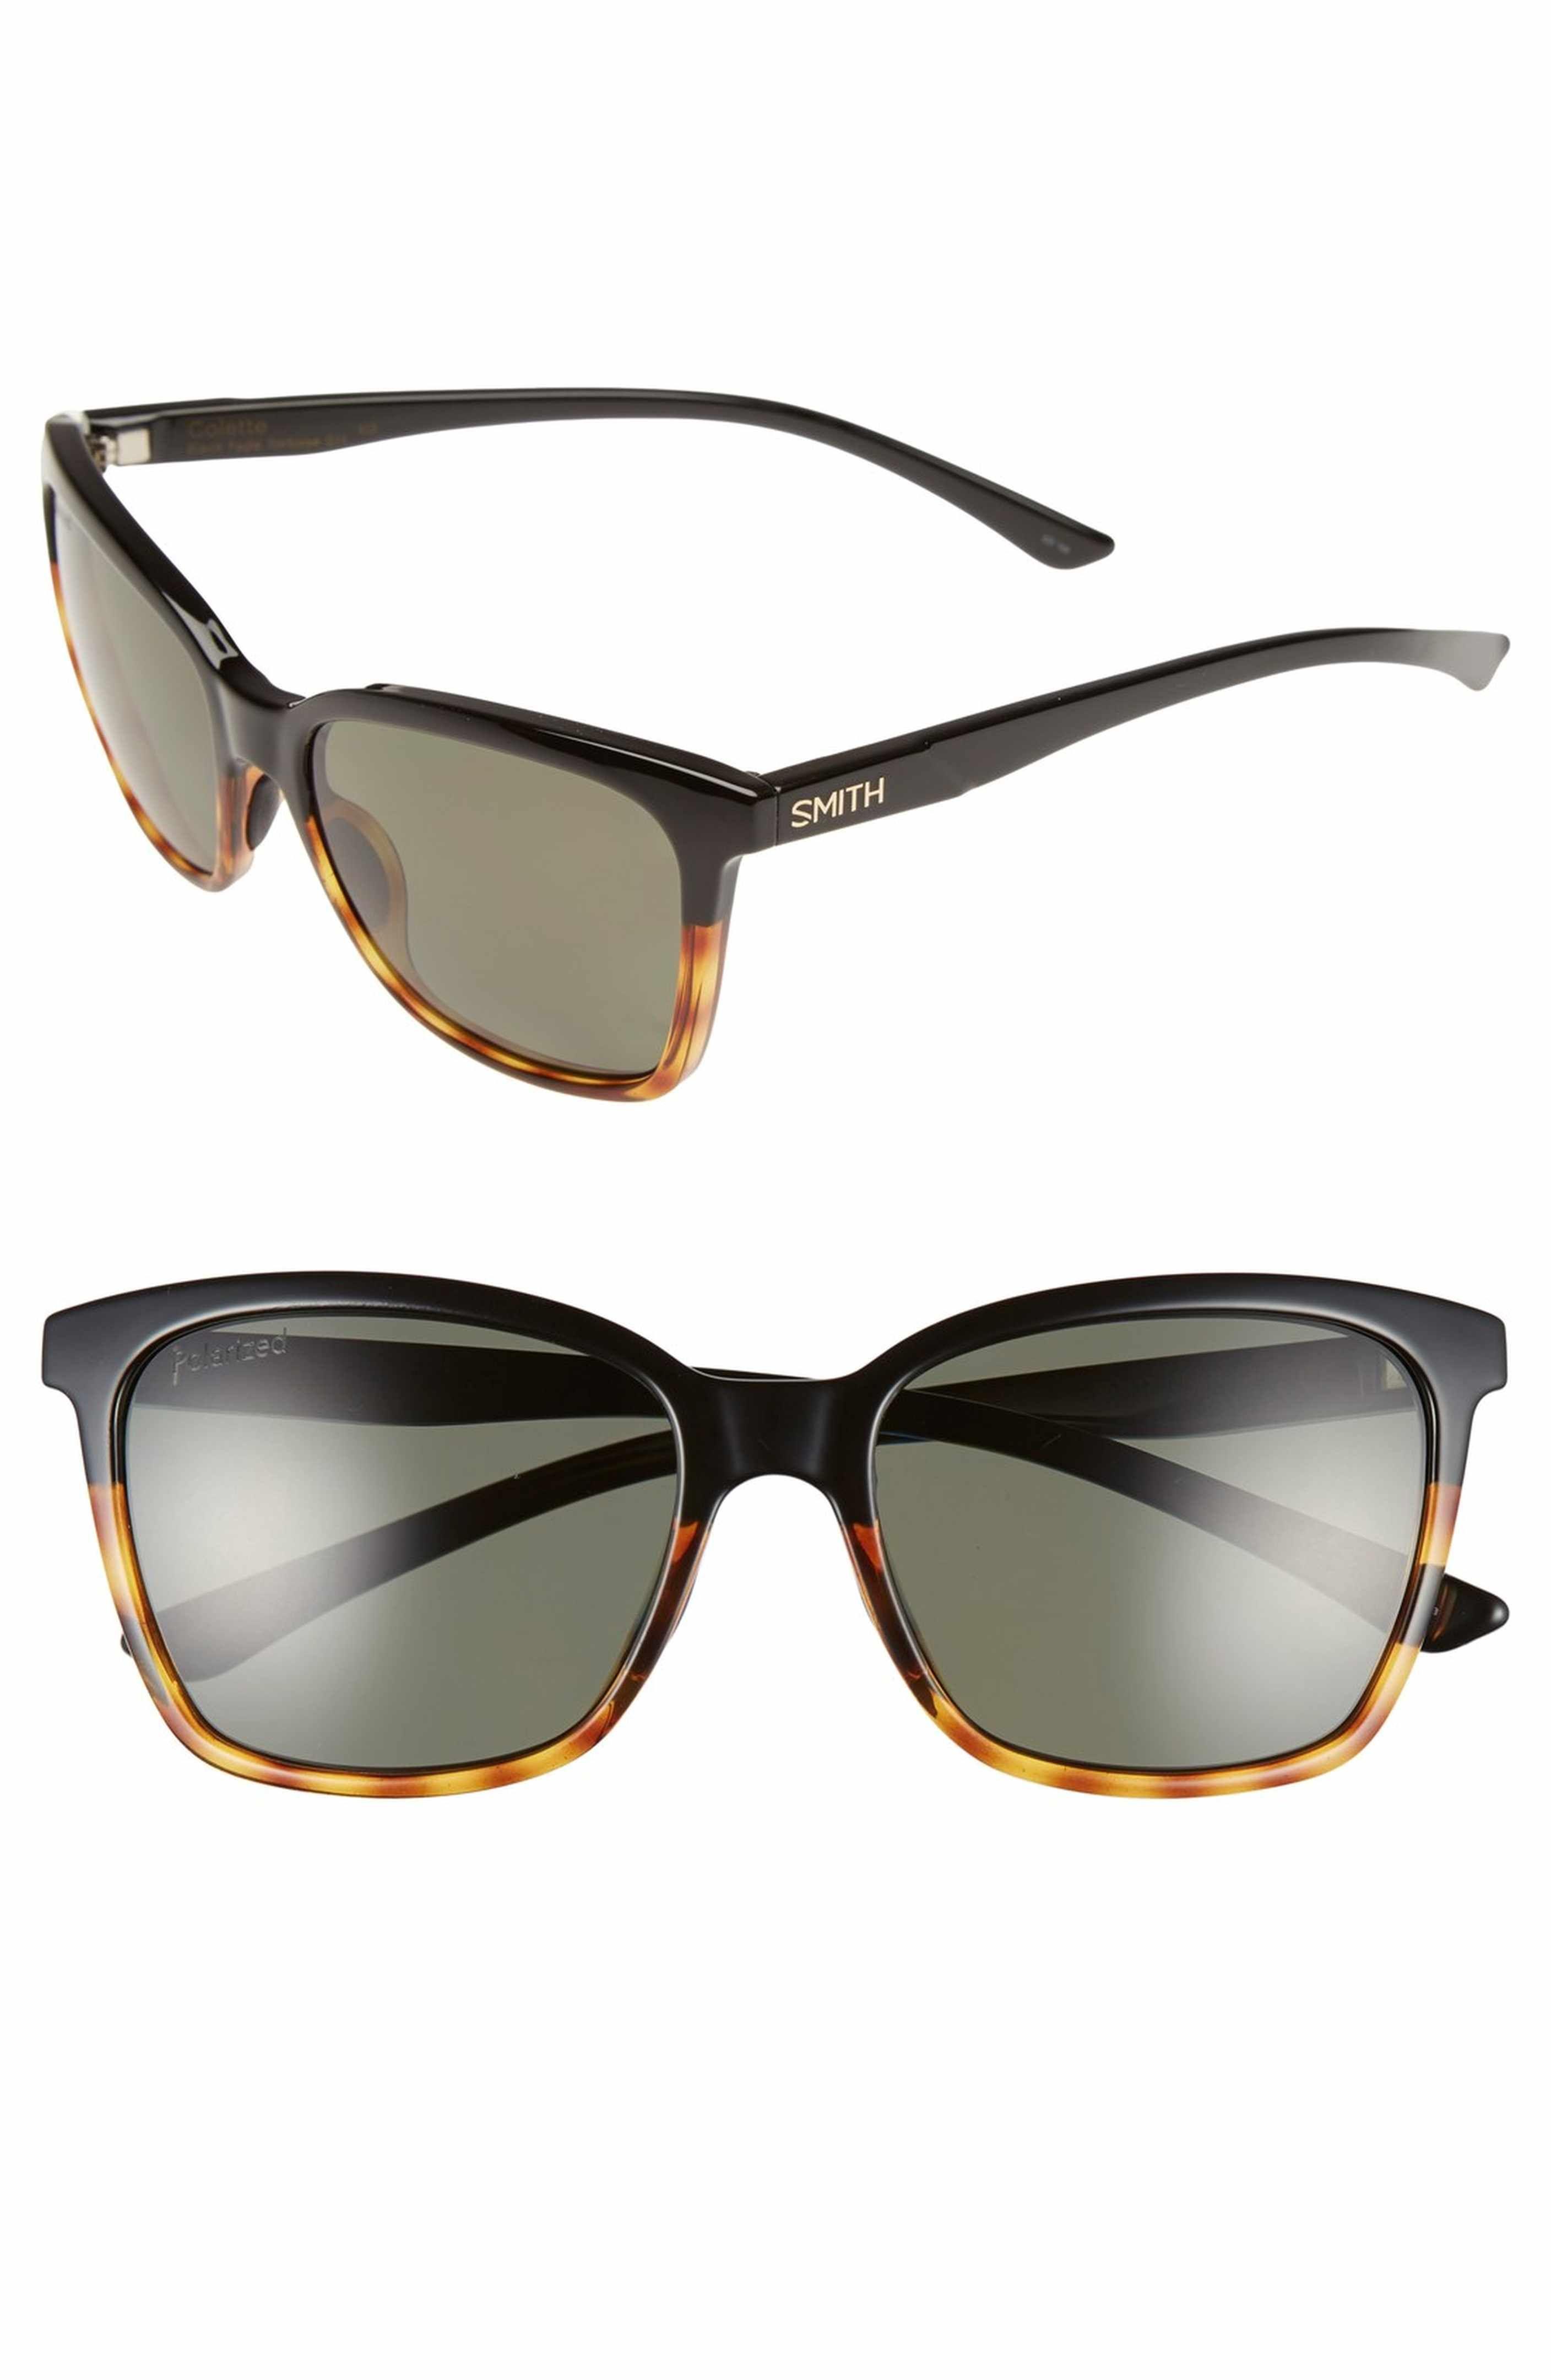 Smith Colette 55mm ChromaPop™ Polarized Sunglasses